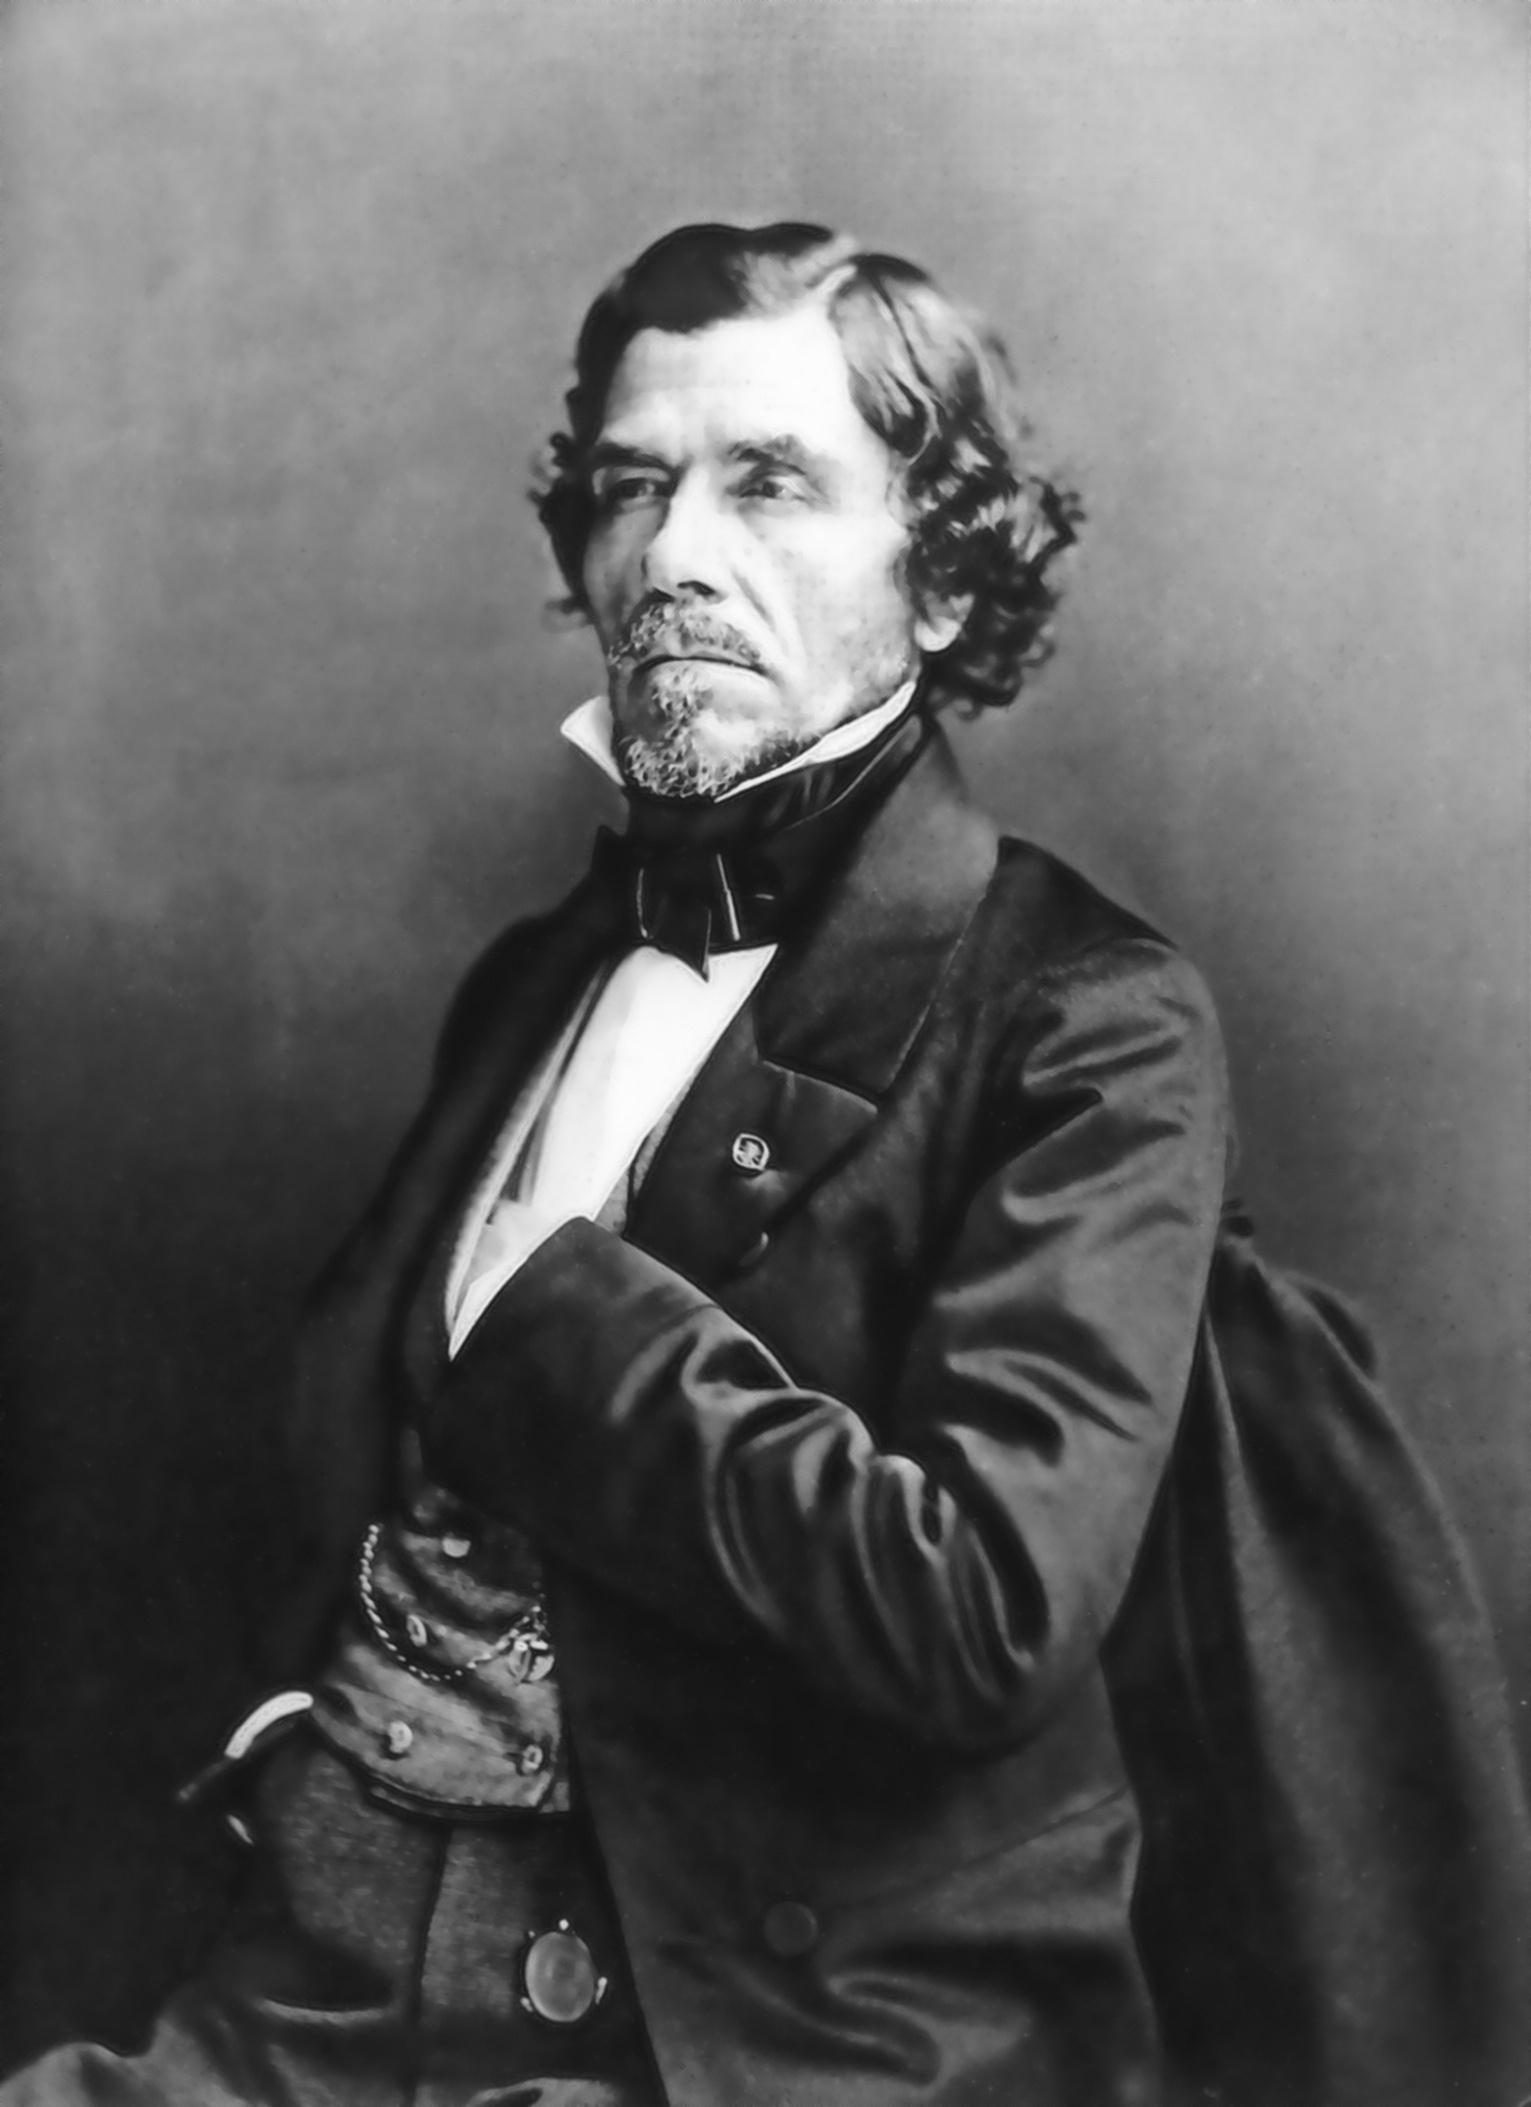 Eugène Delacroix, {{circa}} 1857 (portrait by [[Nadar (photographer)|Nadar]])